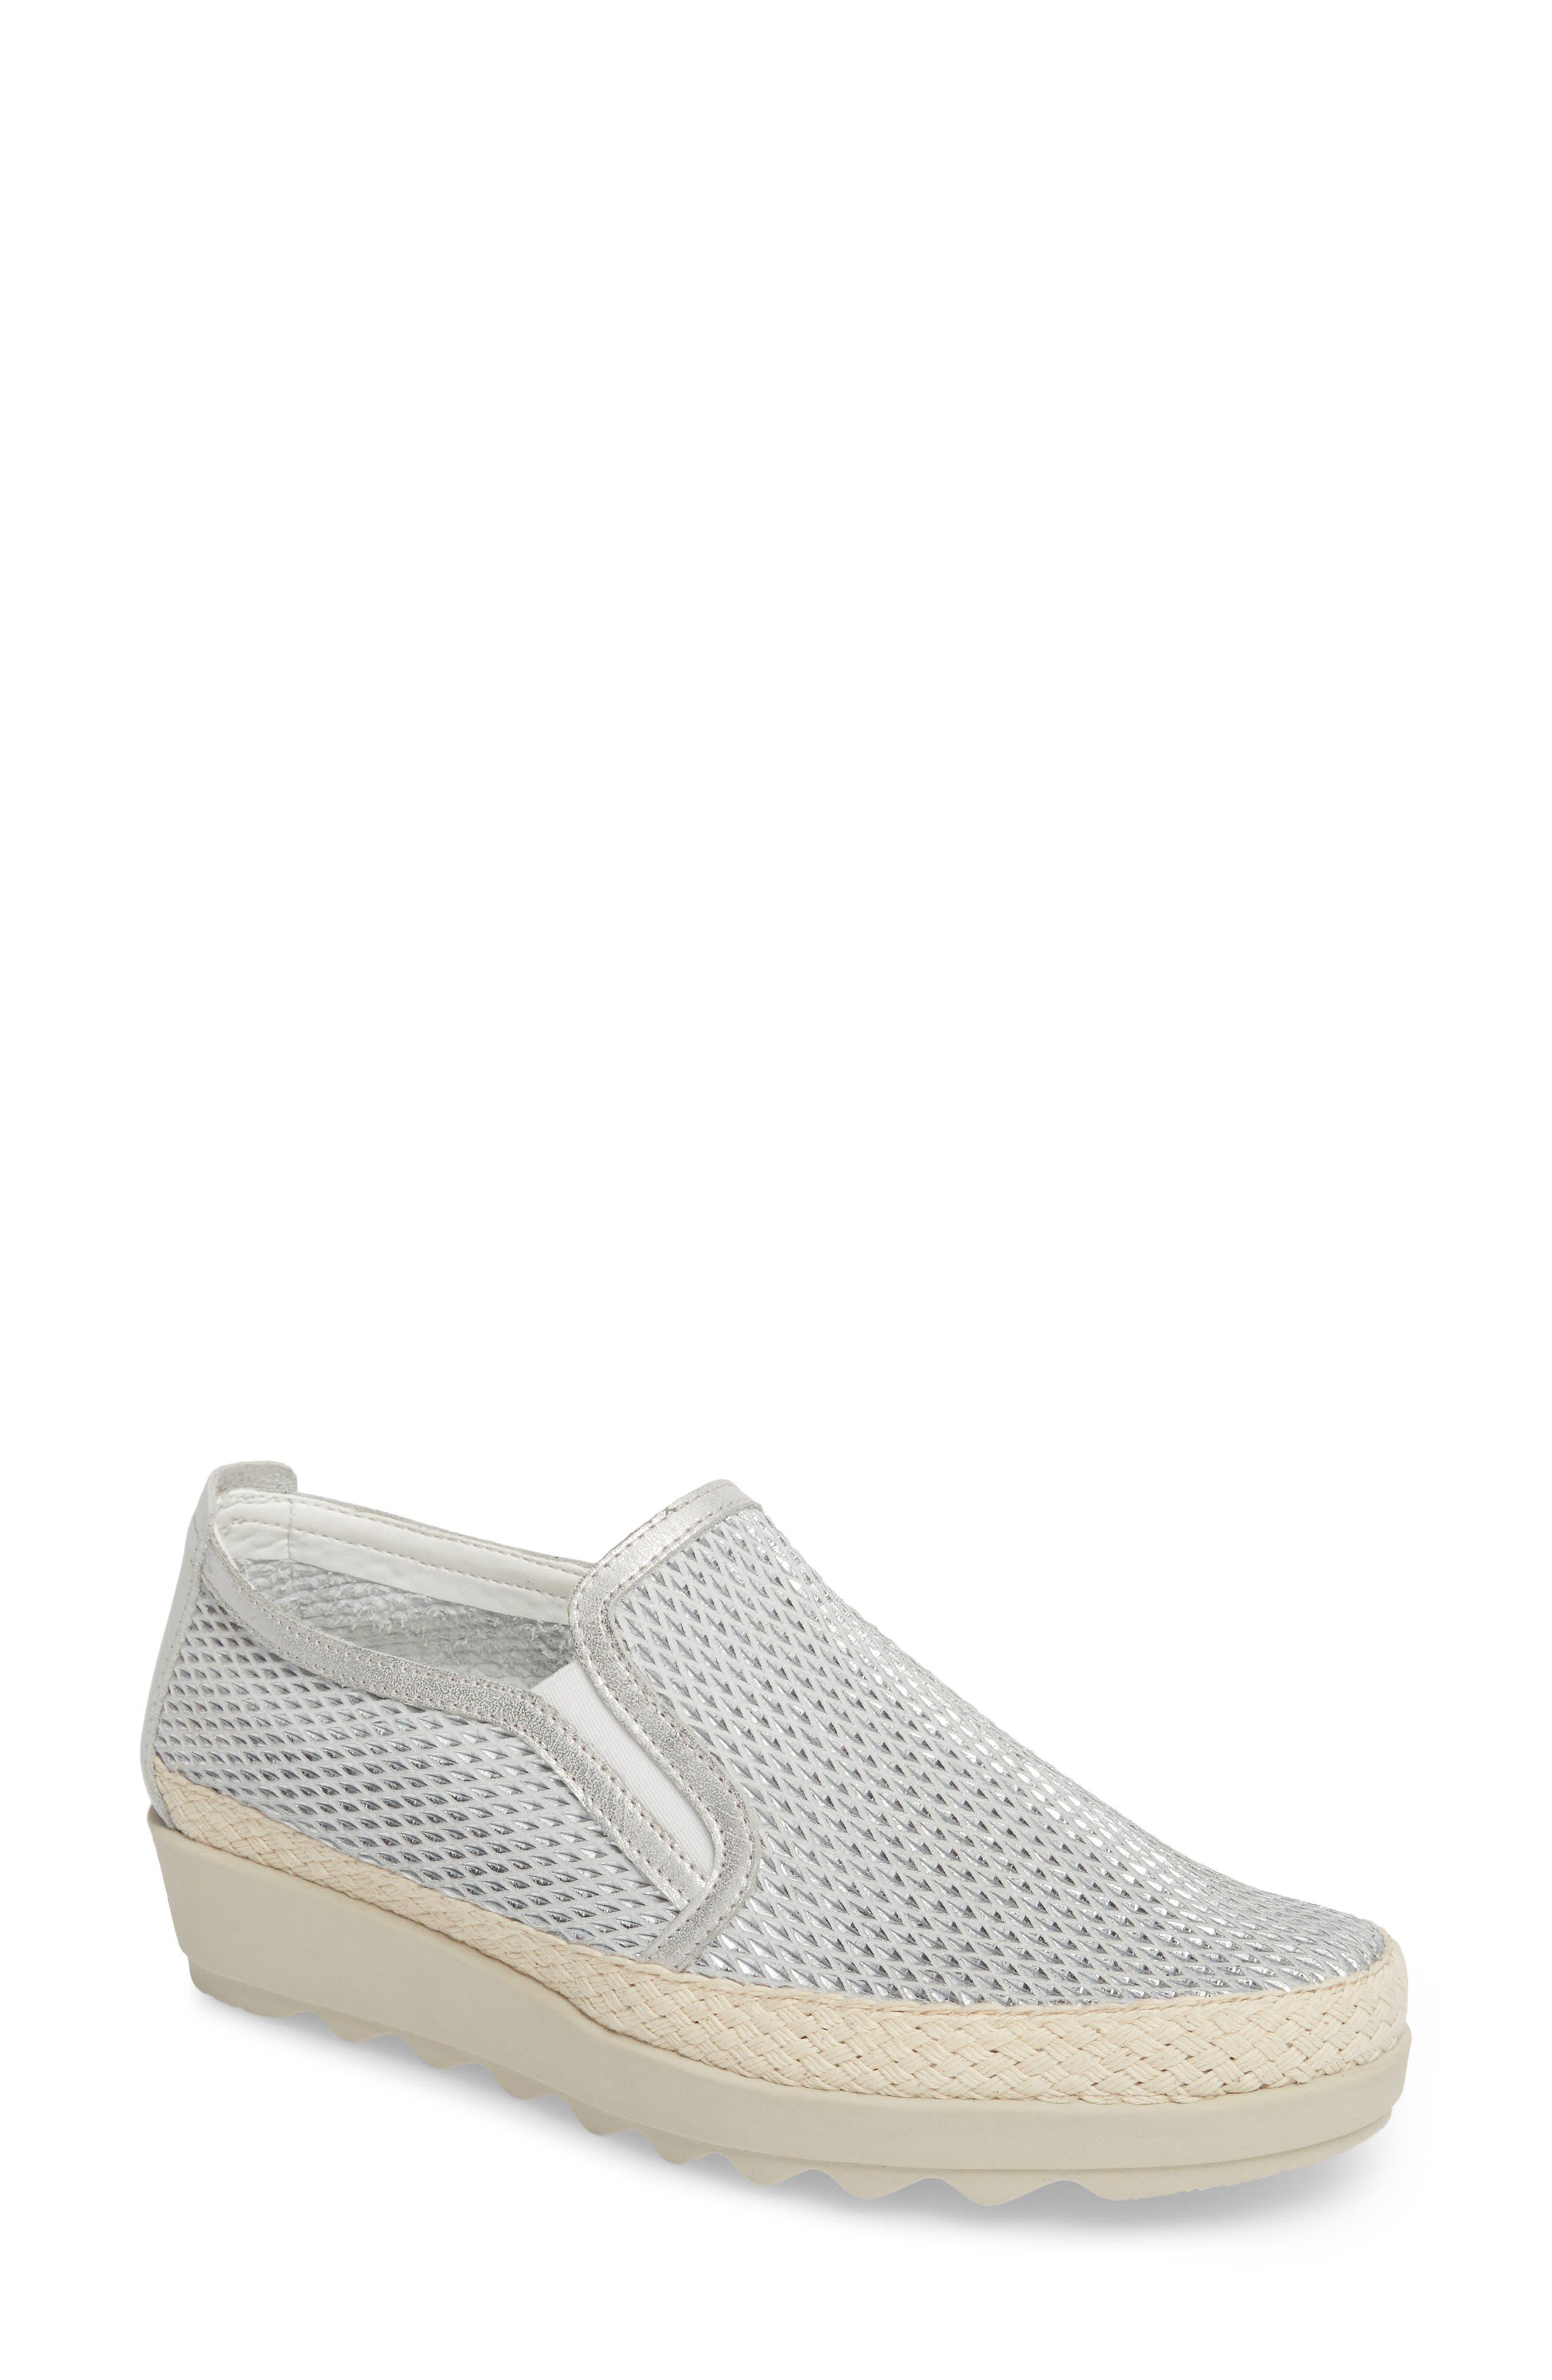 The Flexx Call Me Perforated Slip-On Sneaker, Metallic